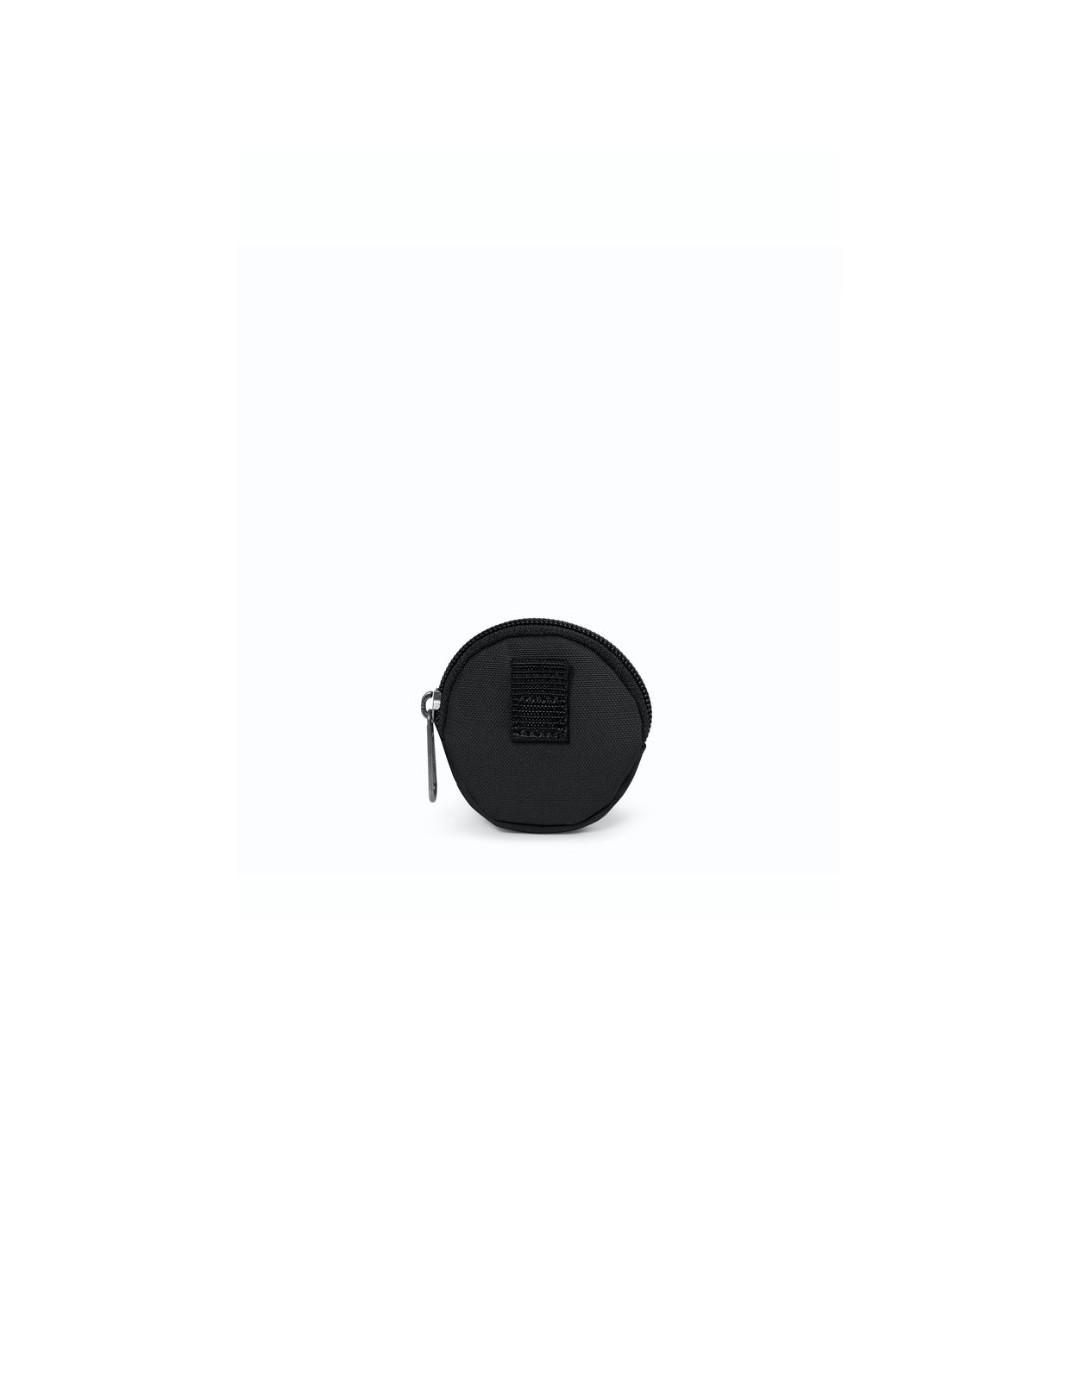 MONEDERO EASTPAK GROUPIE SINGLE BLACK